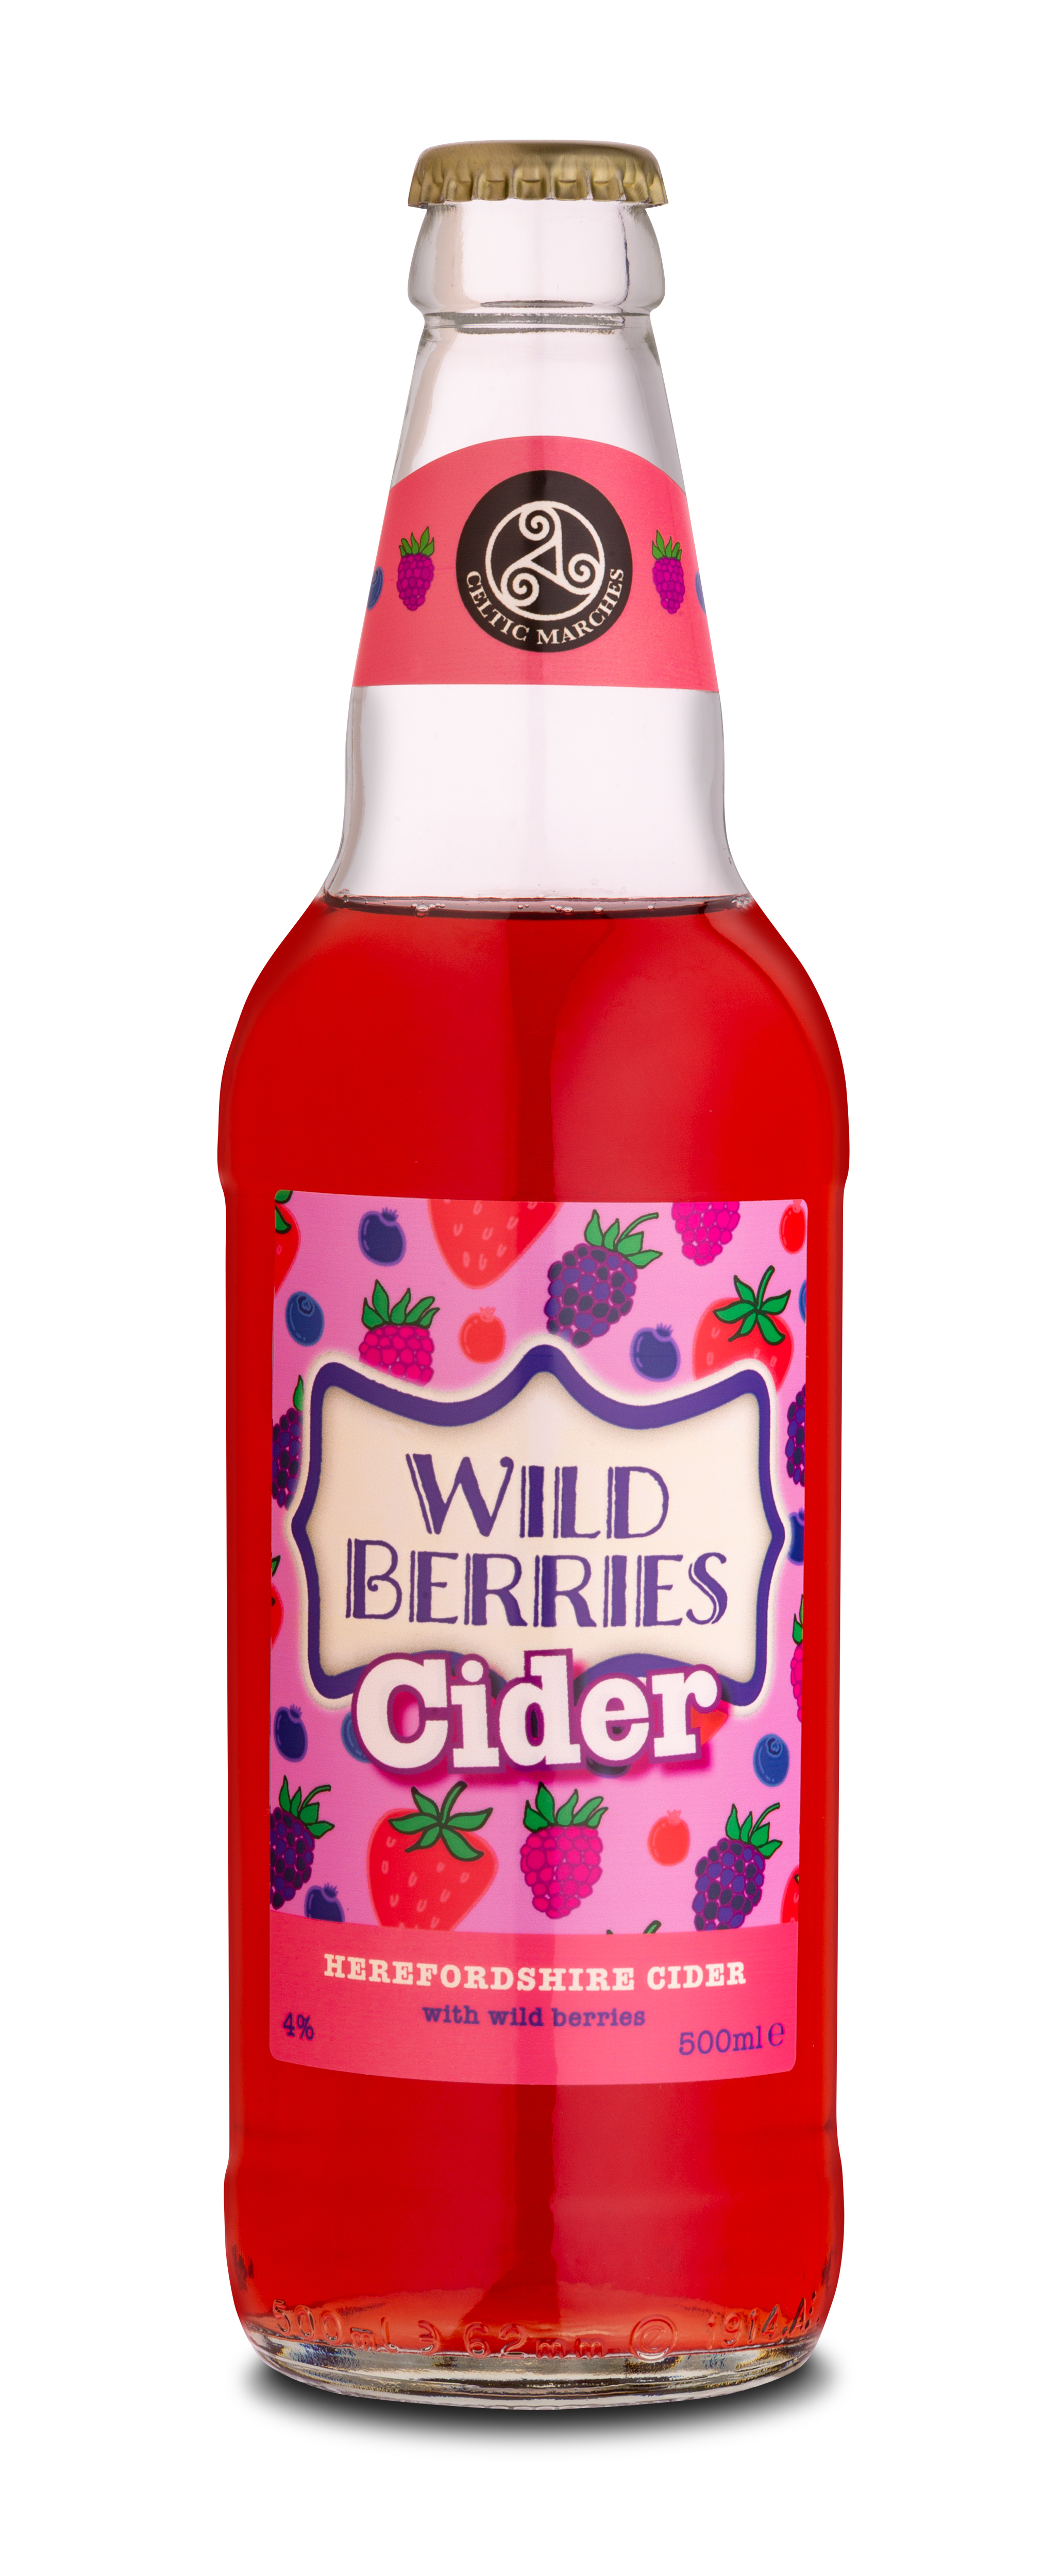 Celtic Marches Wild Berries Cider 12x500ml Bottles 4.0%